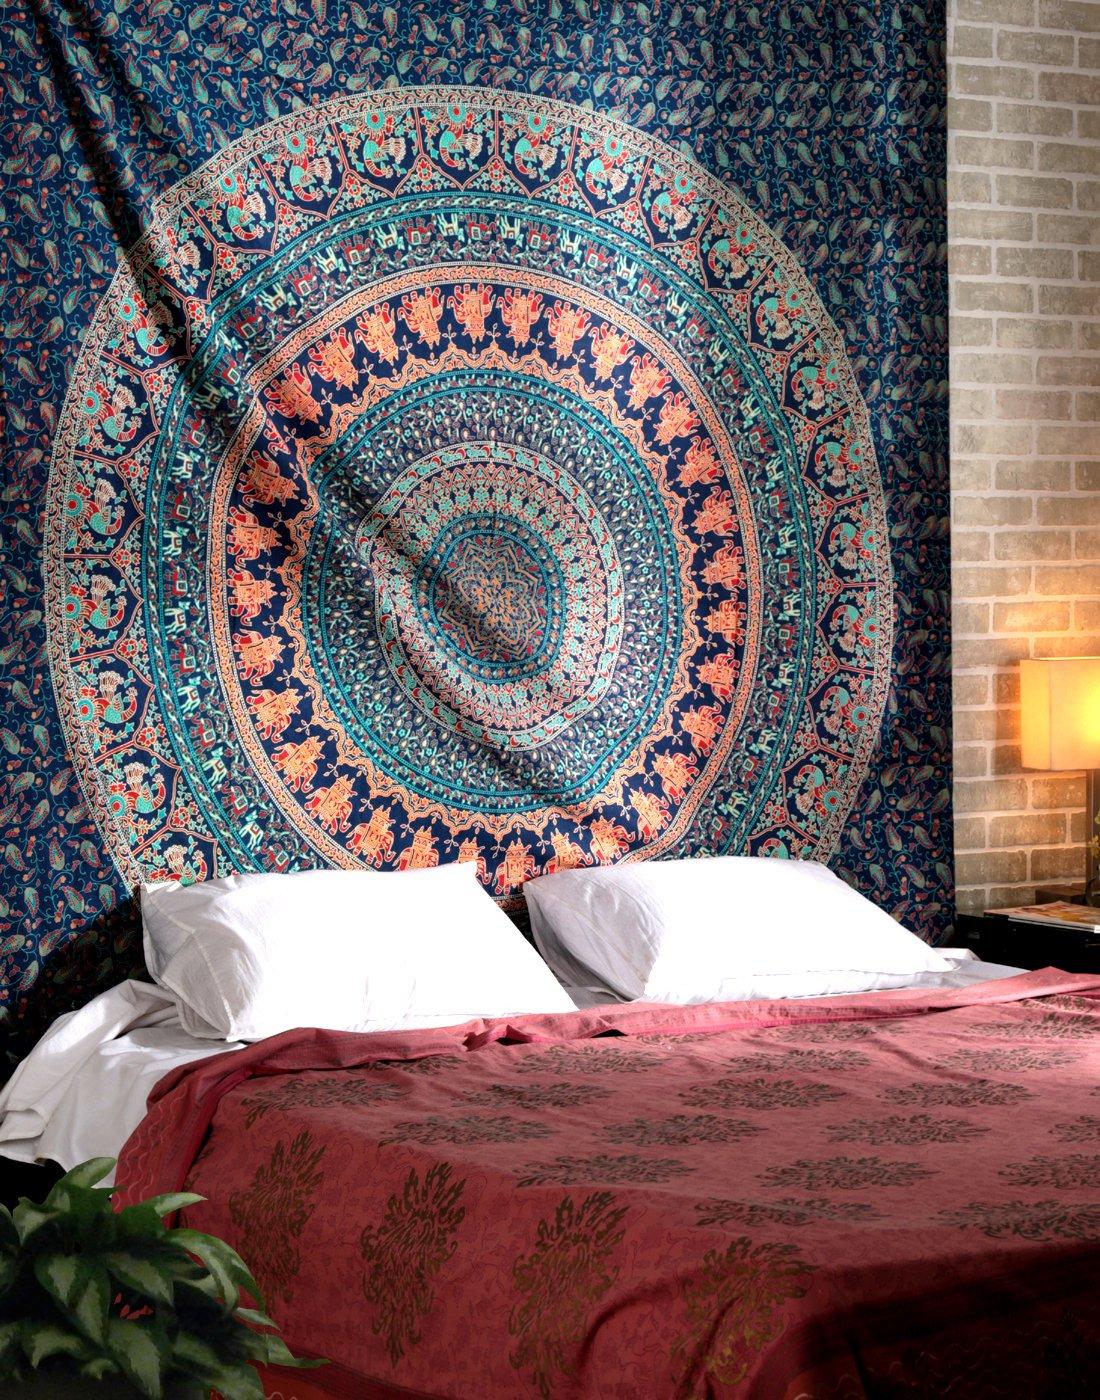 RAJRANG Boho College Dorm Decor Beach Throw Tapestries - Indian Cotton Decorative Wall Hanging Tapestry Bohemian Elephant Tapestries 90 x 84